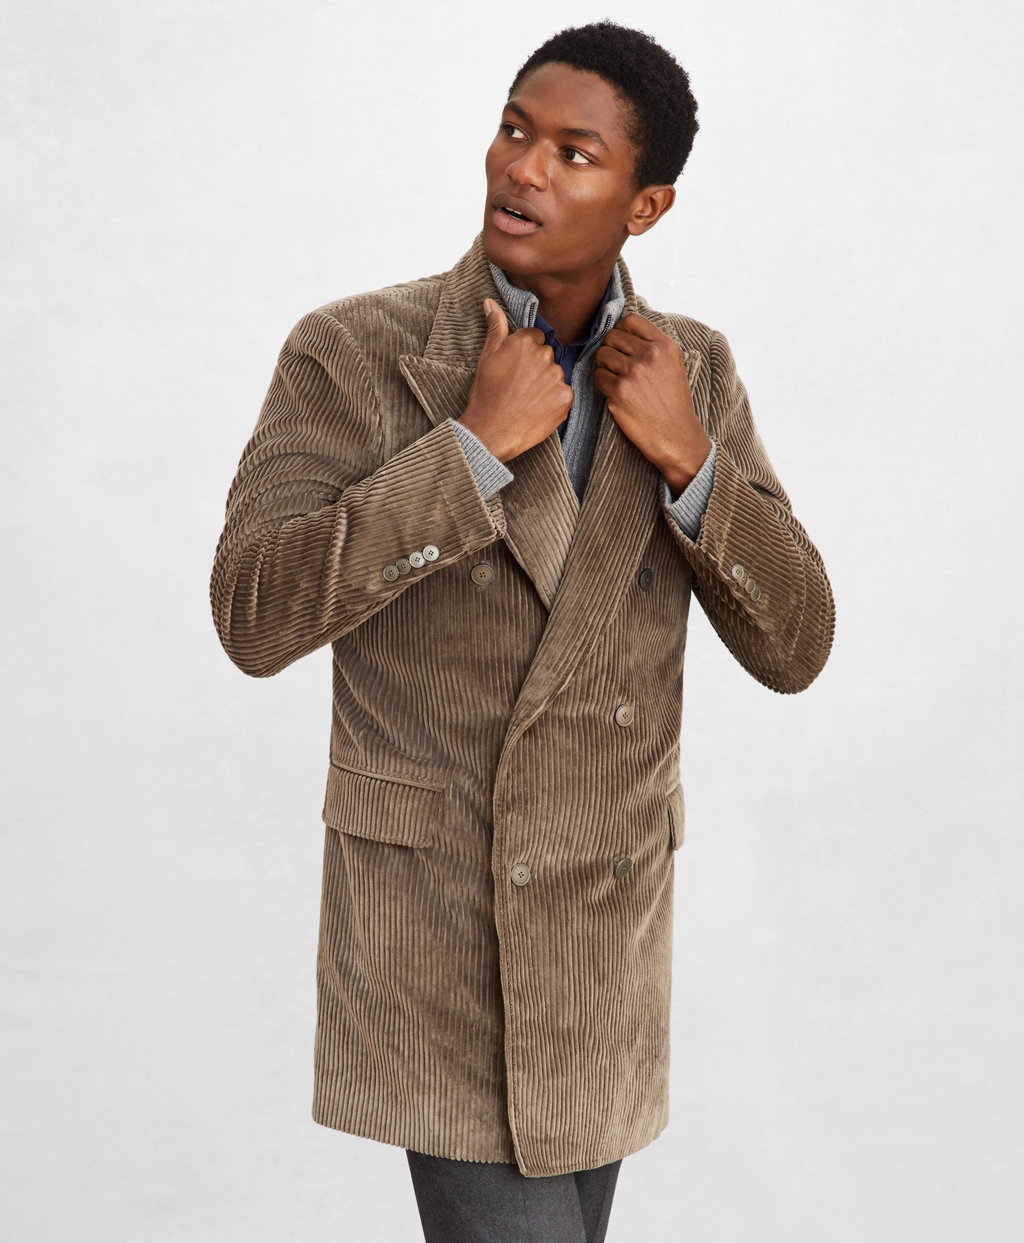 70s Jackets & Hippie Vests, Ponchos Brooks Brothers Mens Golden Fleece Double-Breasted Corduroy Topcoat $1,698.00 AT vintagedancer.com